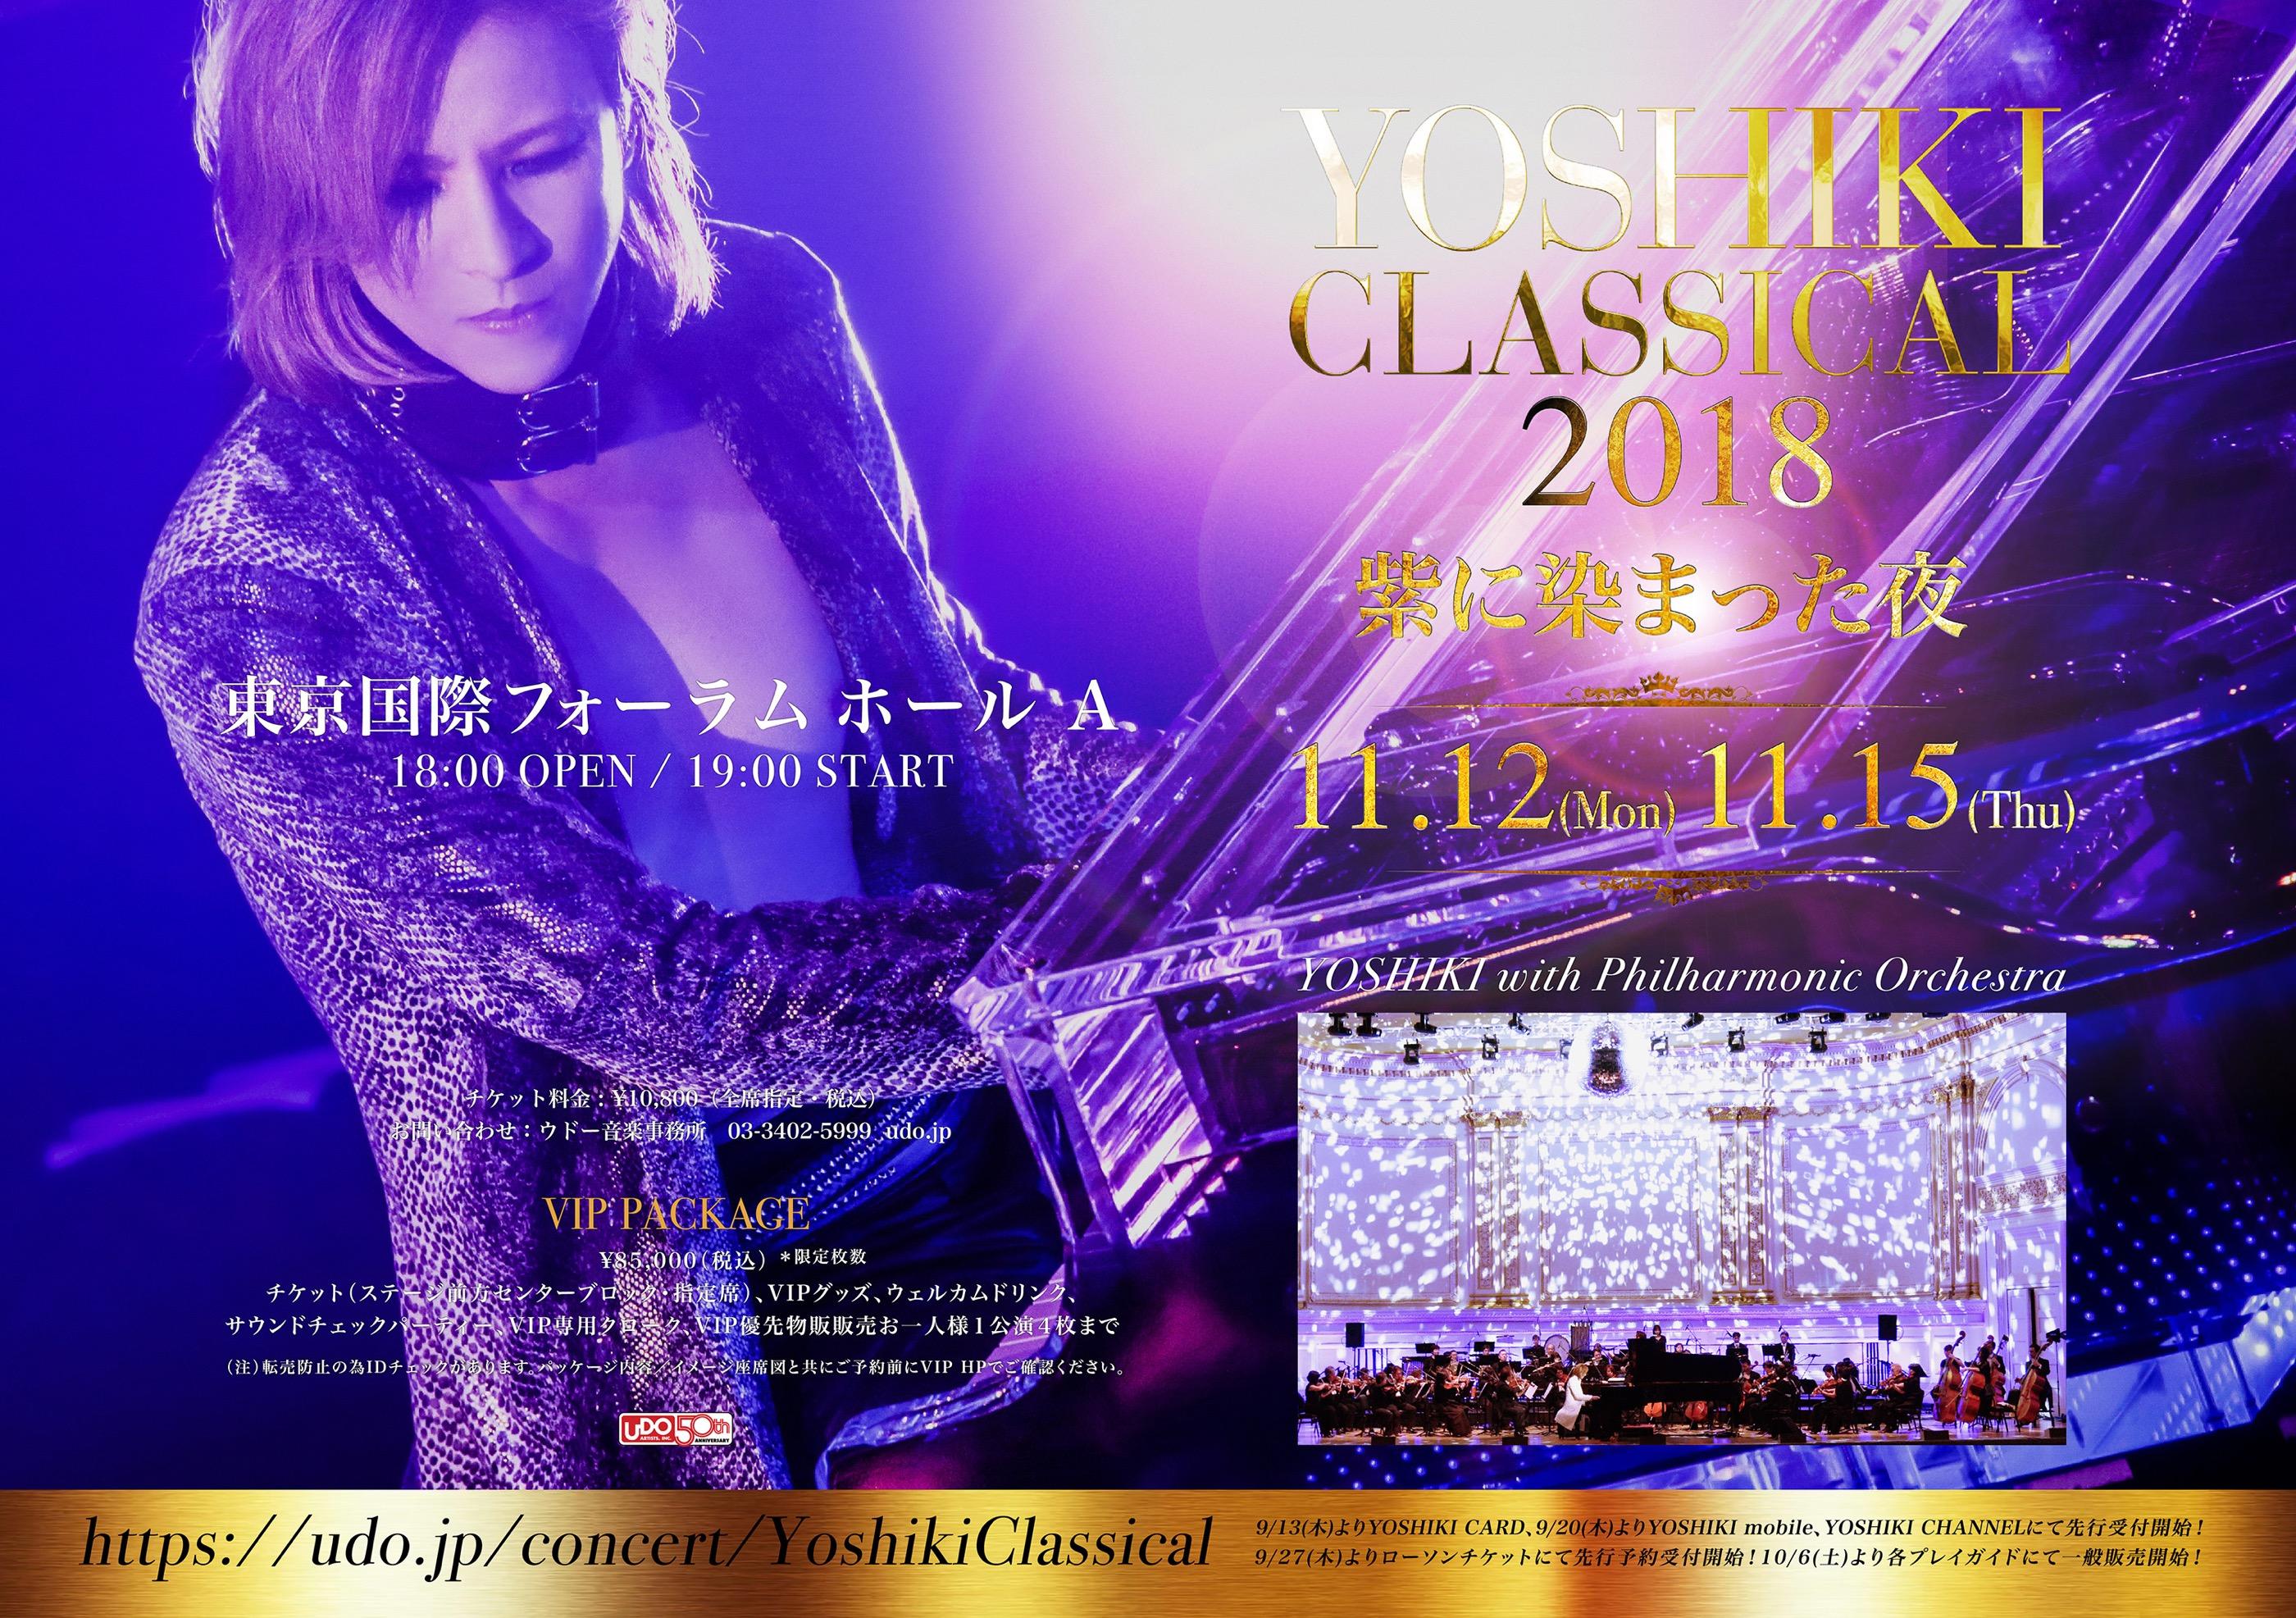 JRock247-Yoshiki-FCCJ-2018-09-13-H-promo